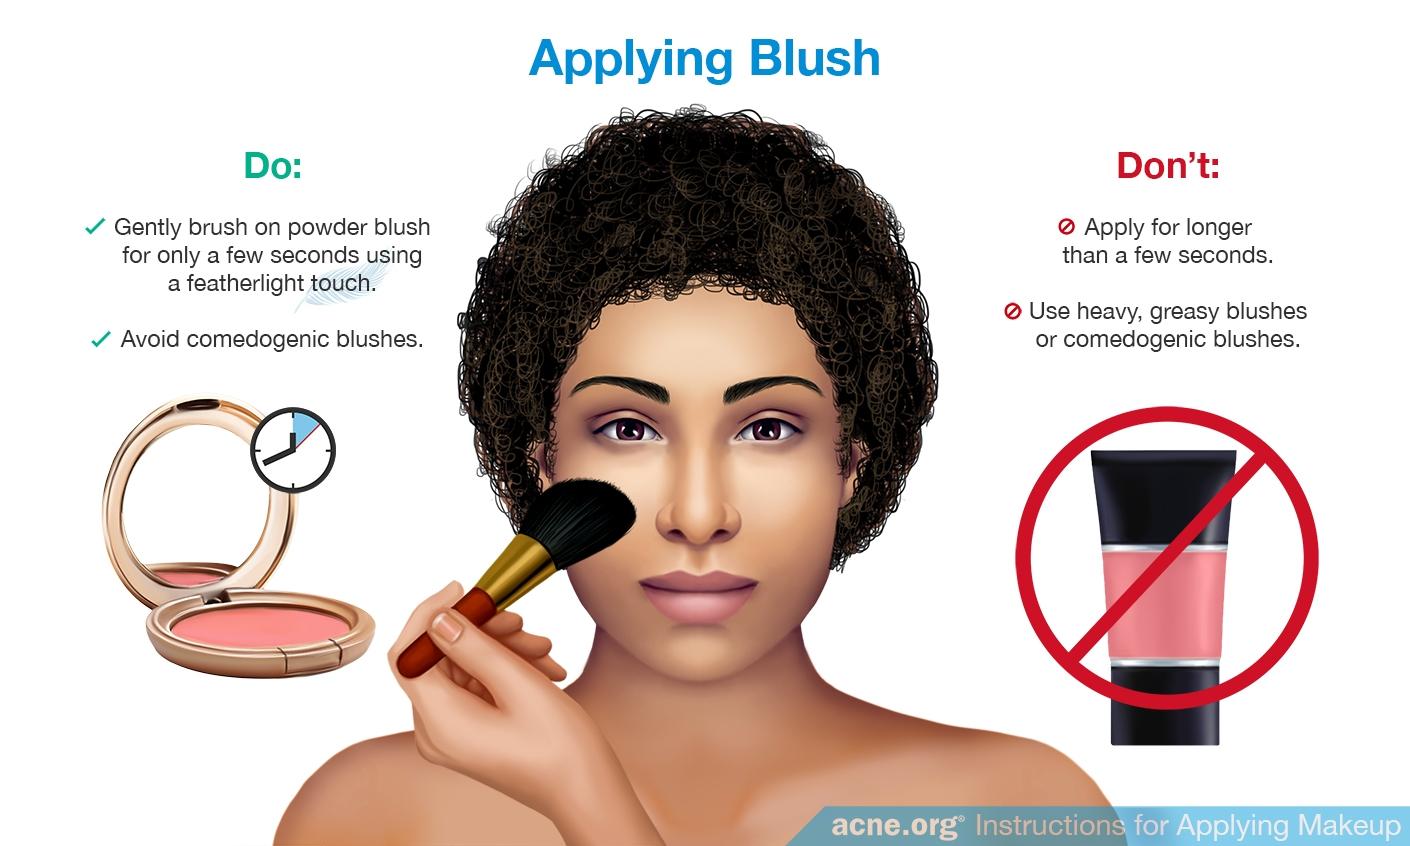 Applying Blush to Acne-prone Skin